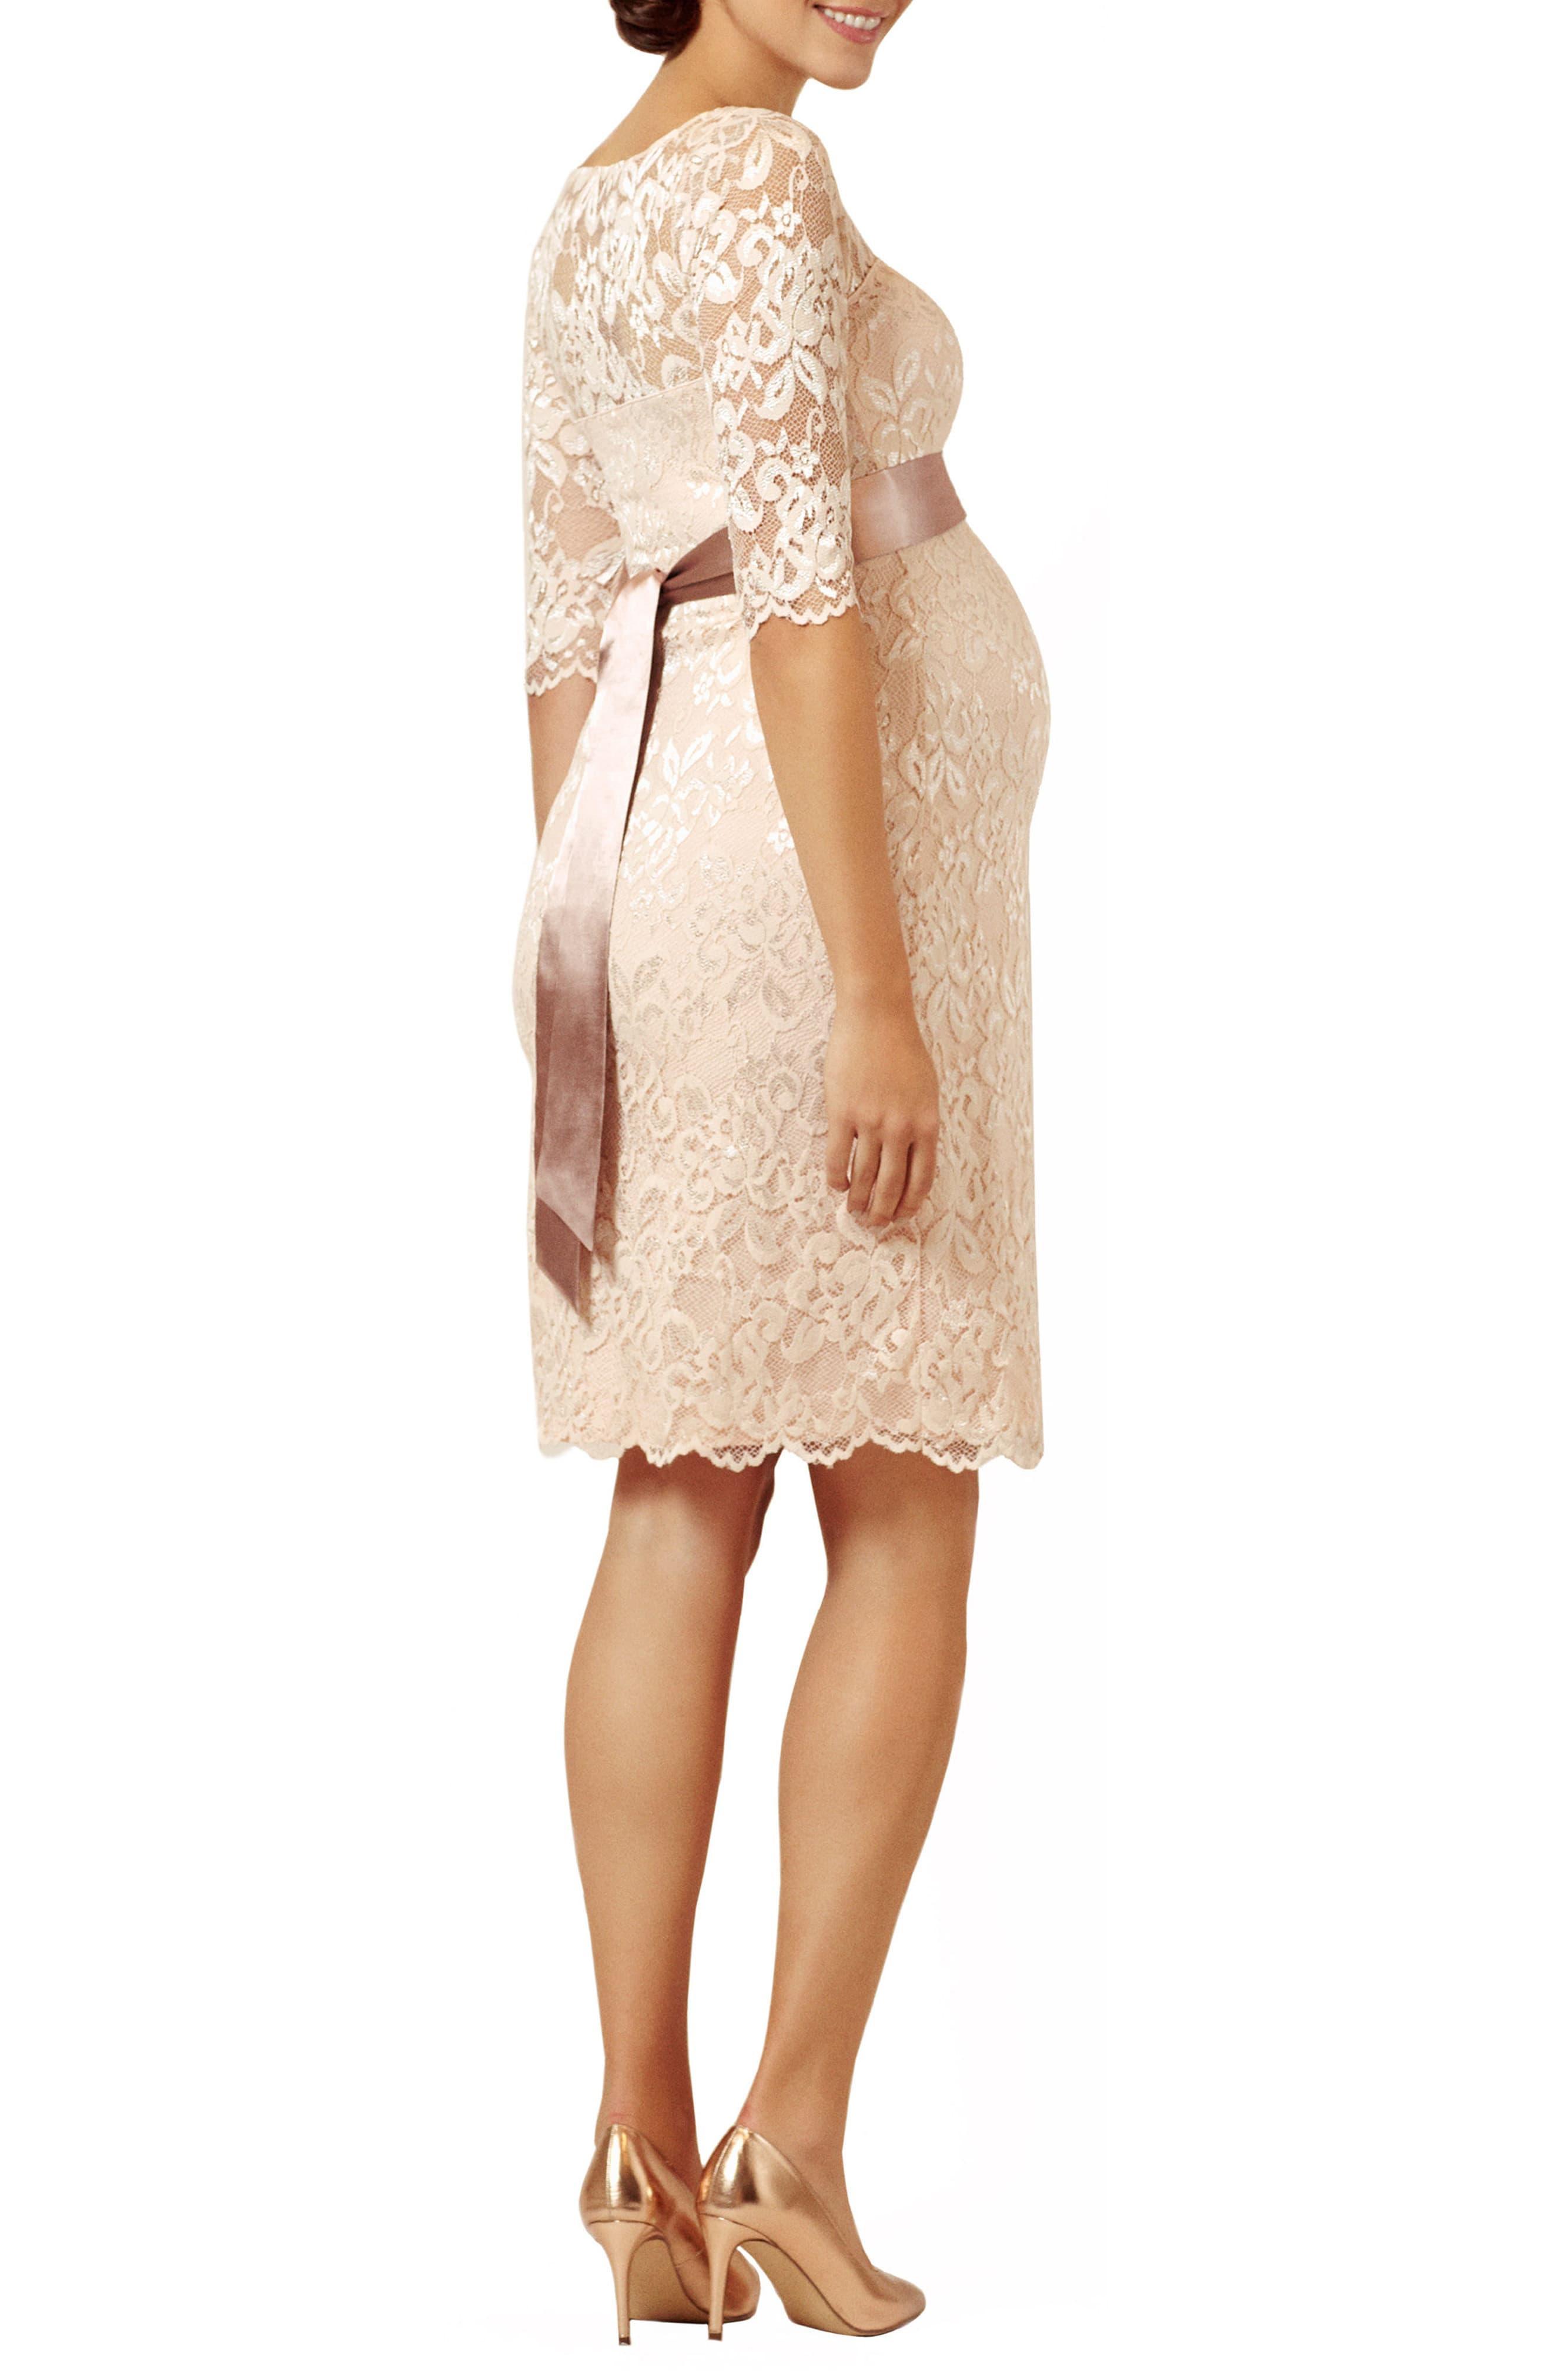 Maternity Amelia Scalloped Lace Dress With Satin Sash